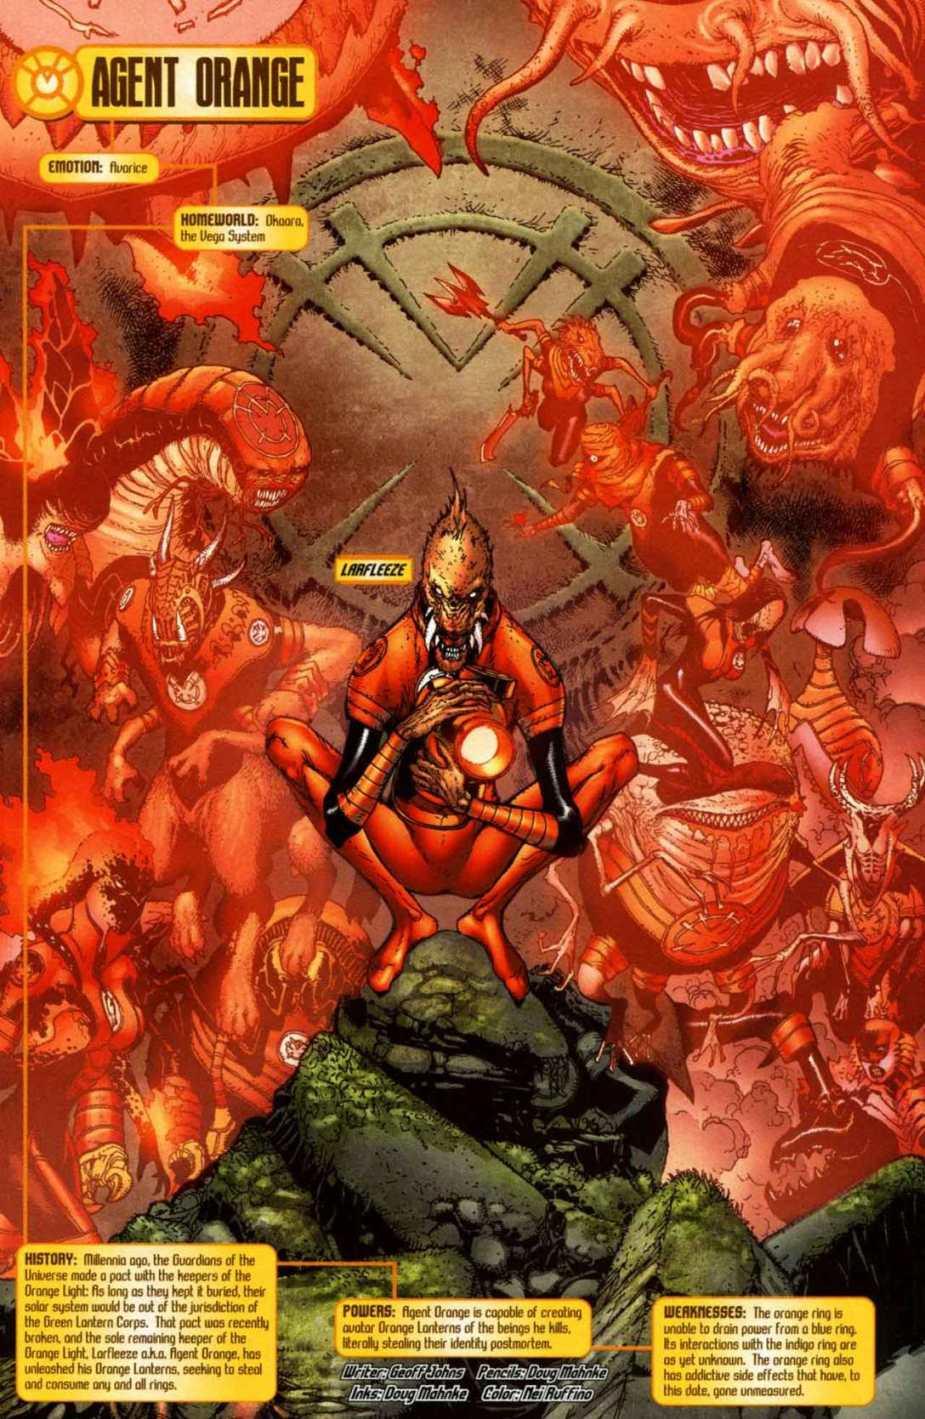 Orange_Lantern_Corps_